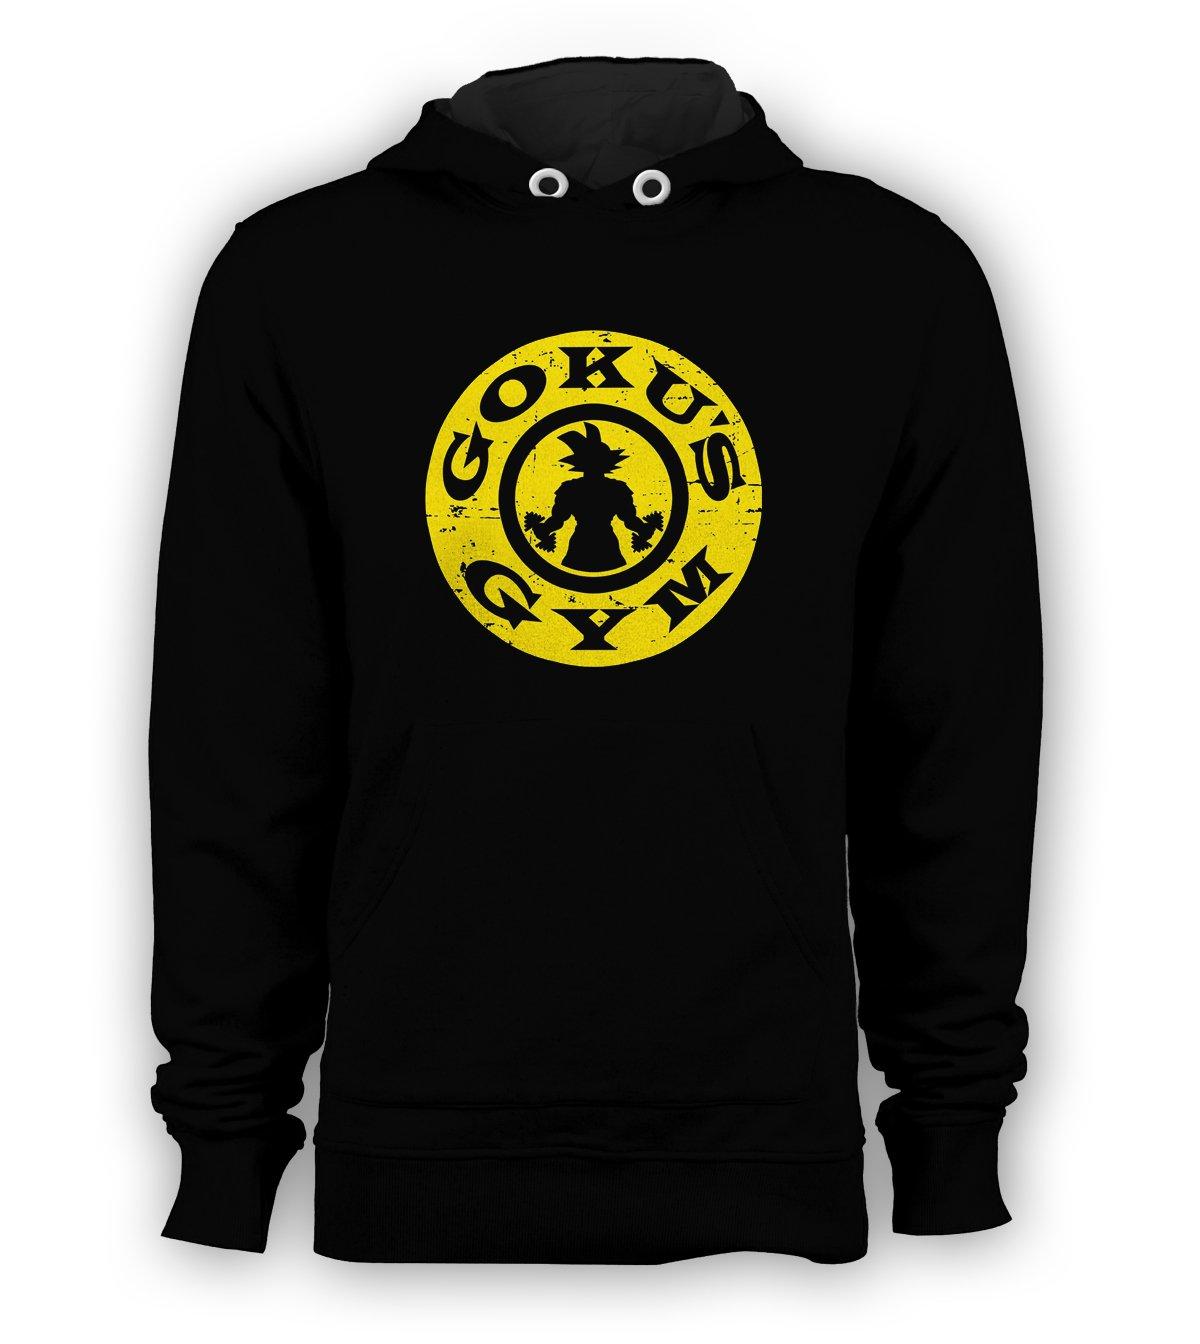 Goku's Gym Bro DBZ Super Saiyan Gym Exercise Pullover Hoodie Men Sweatshirts Size S to 3XL New Black